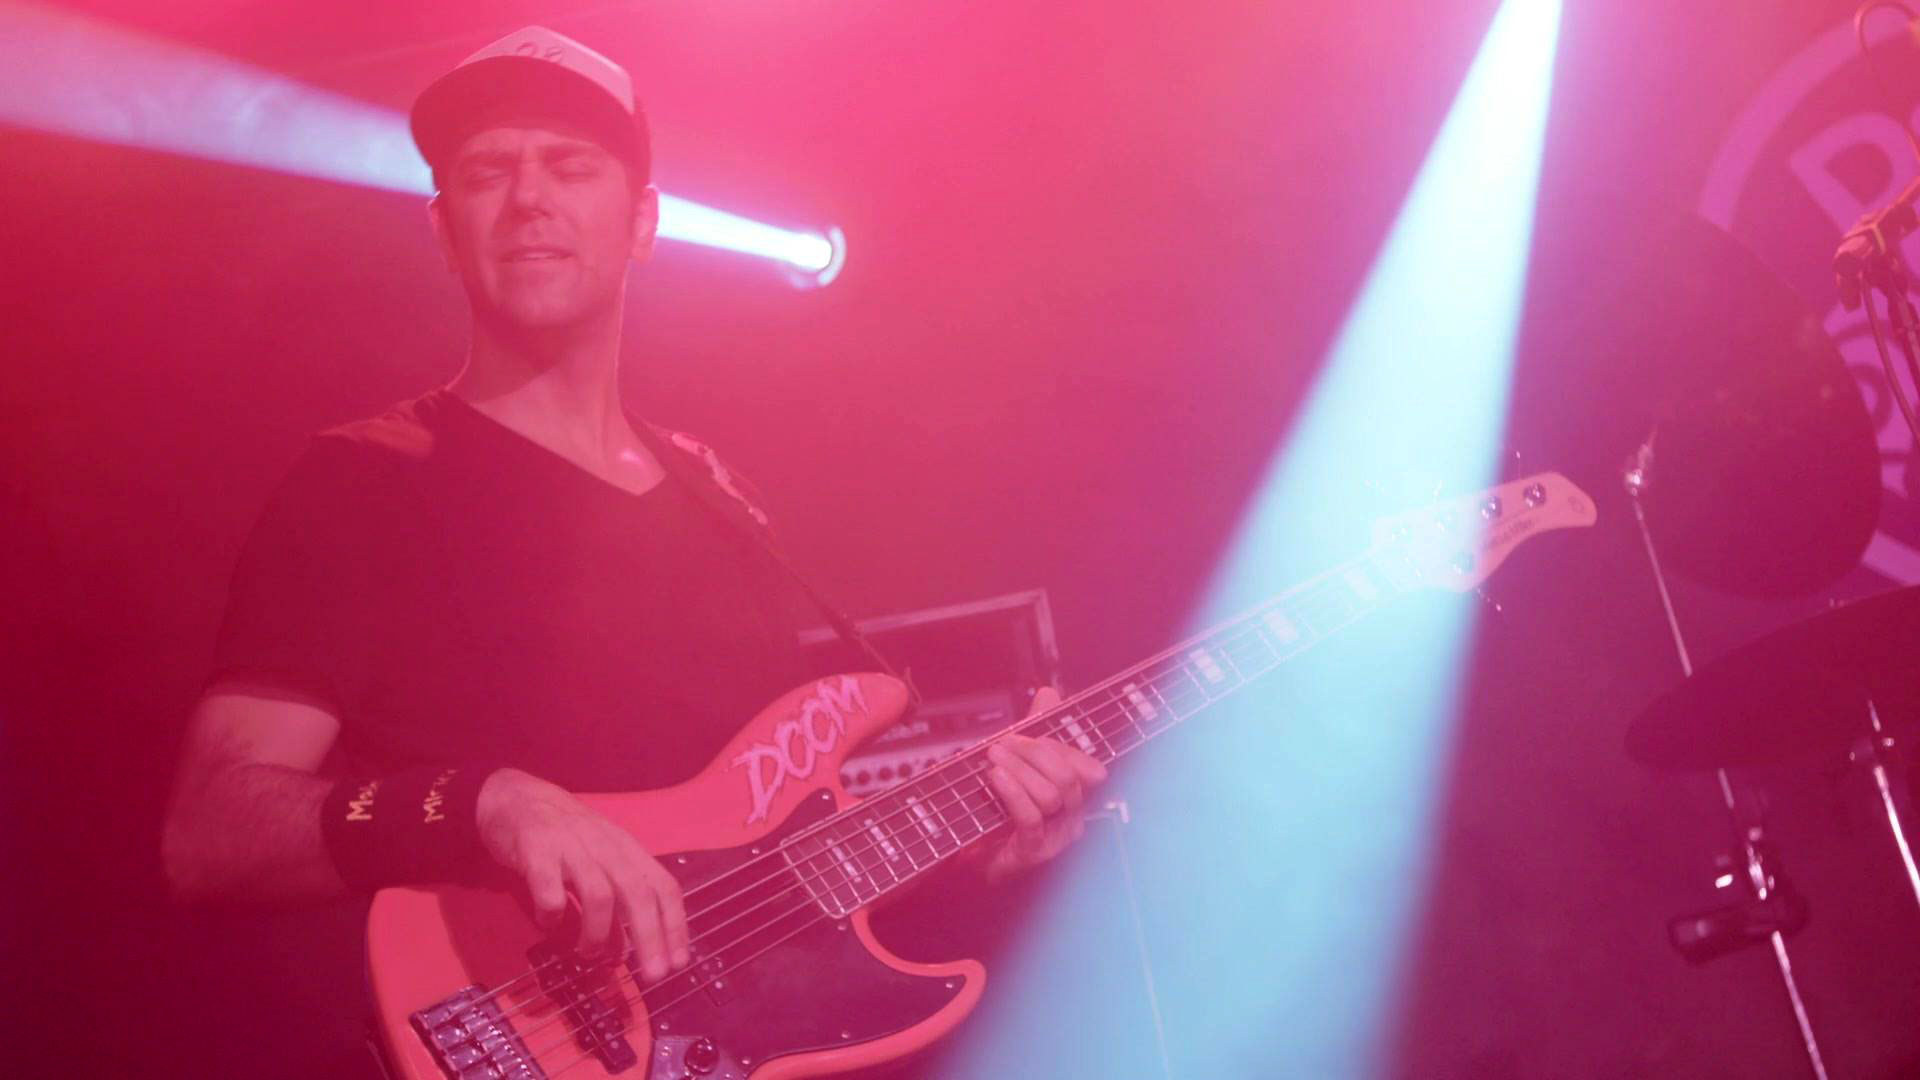 Ryan Stasik and Doom Flamingo Announce Tour Dates, New Single